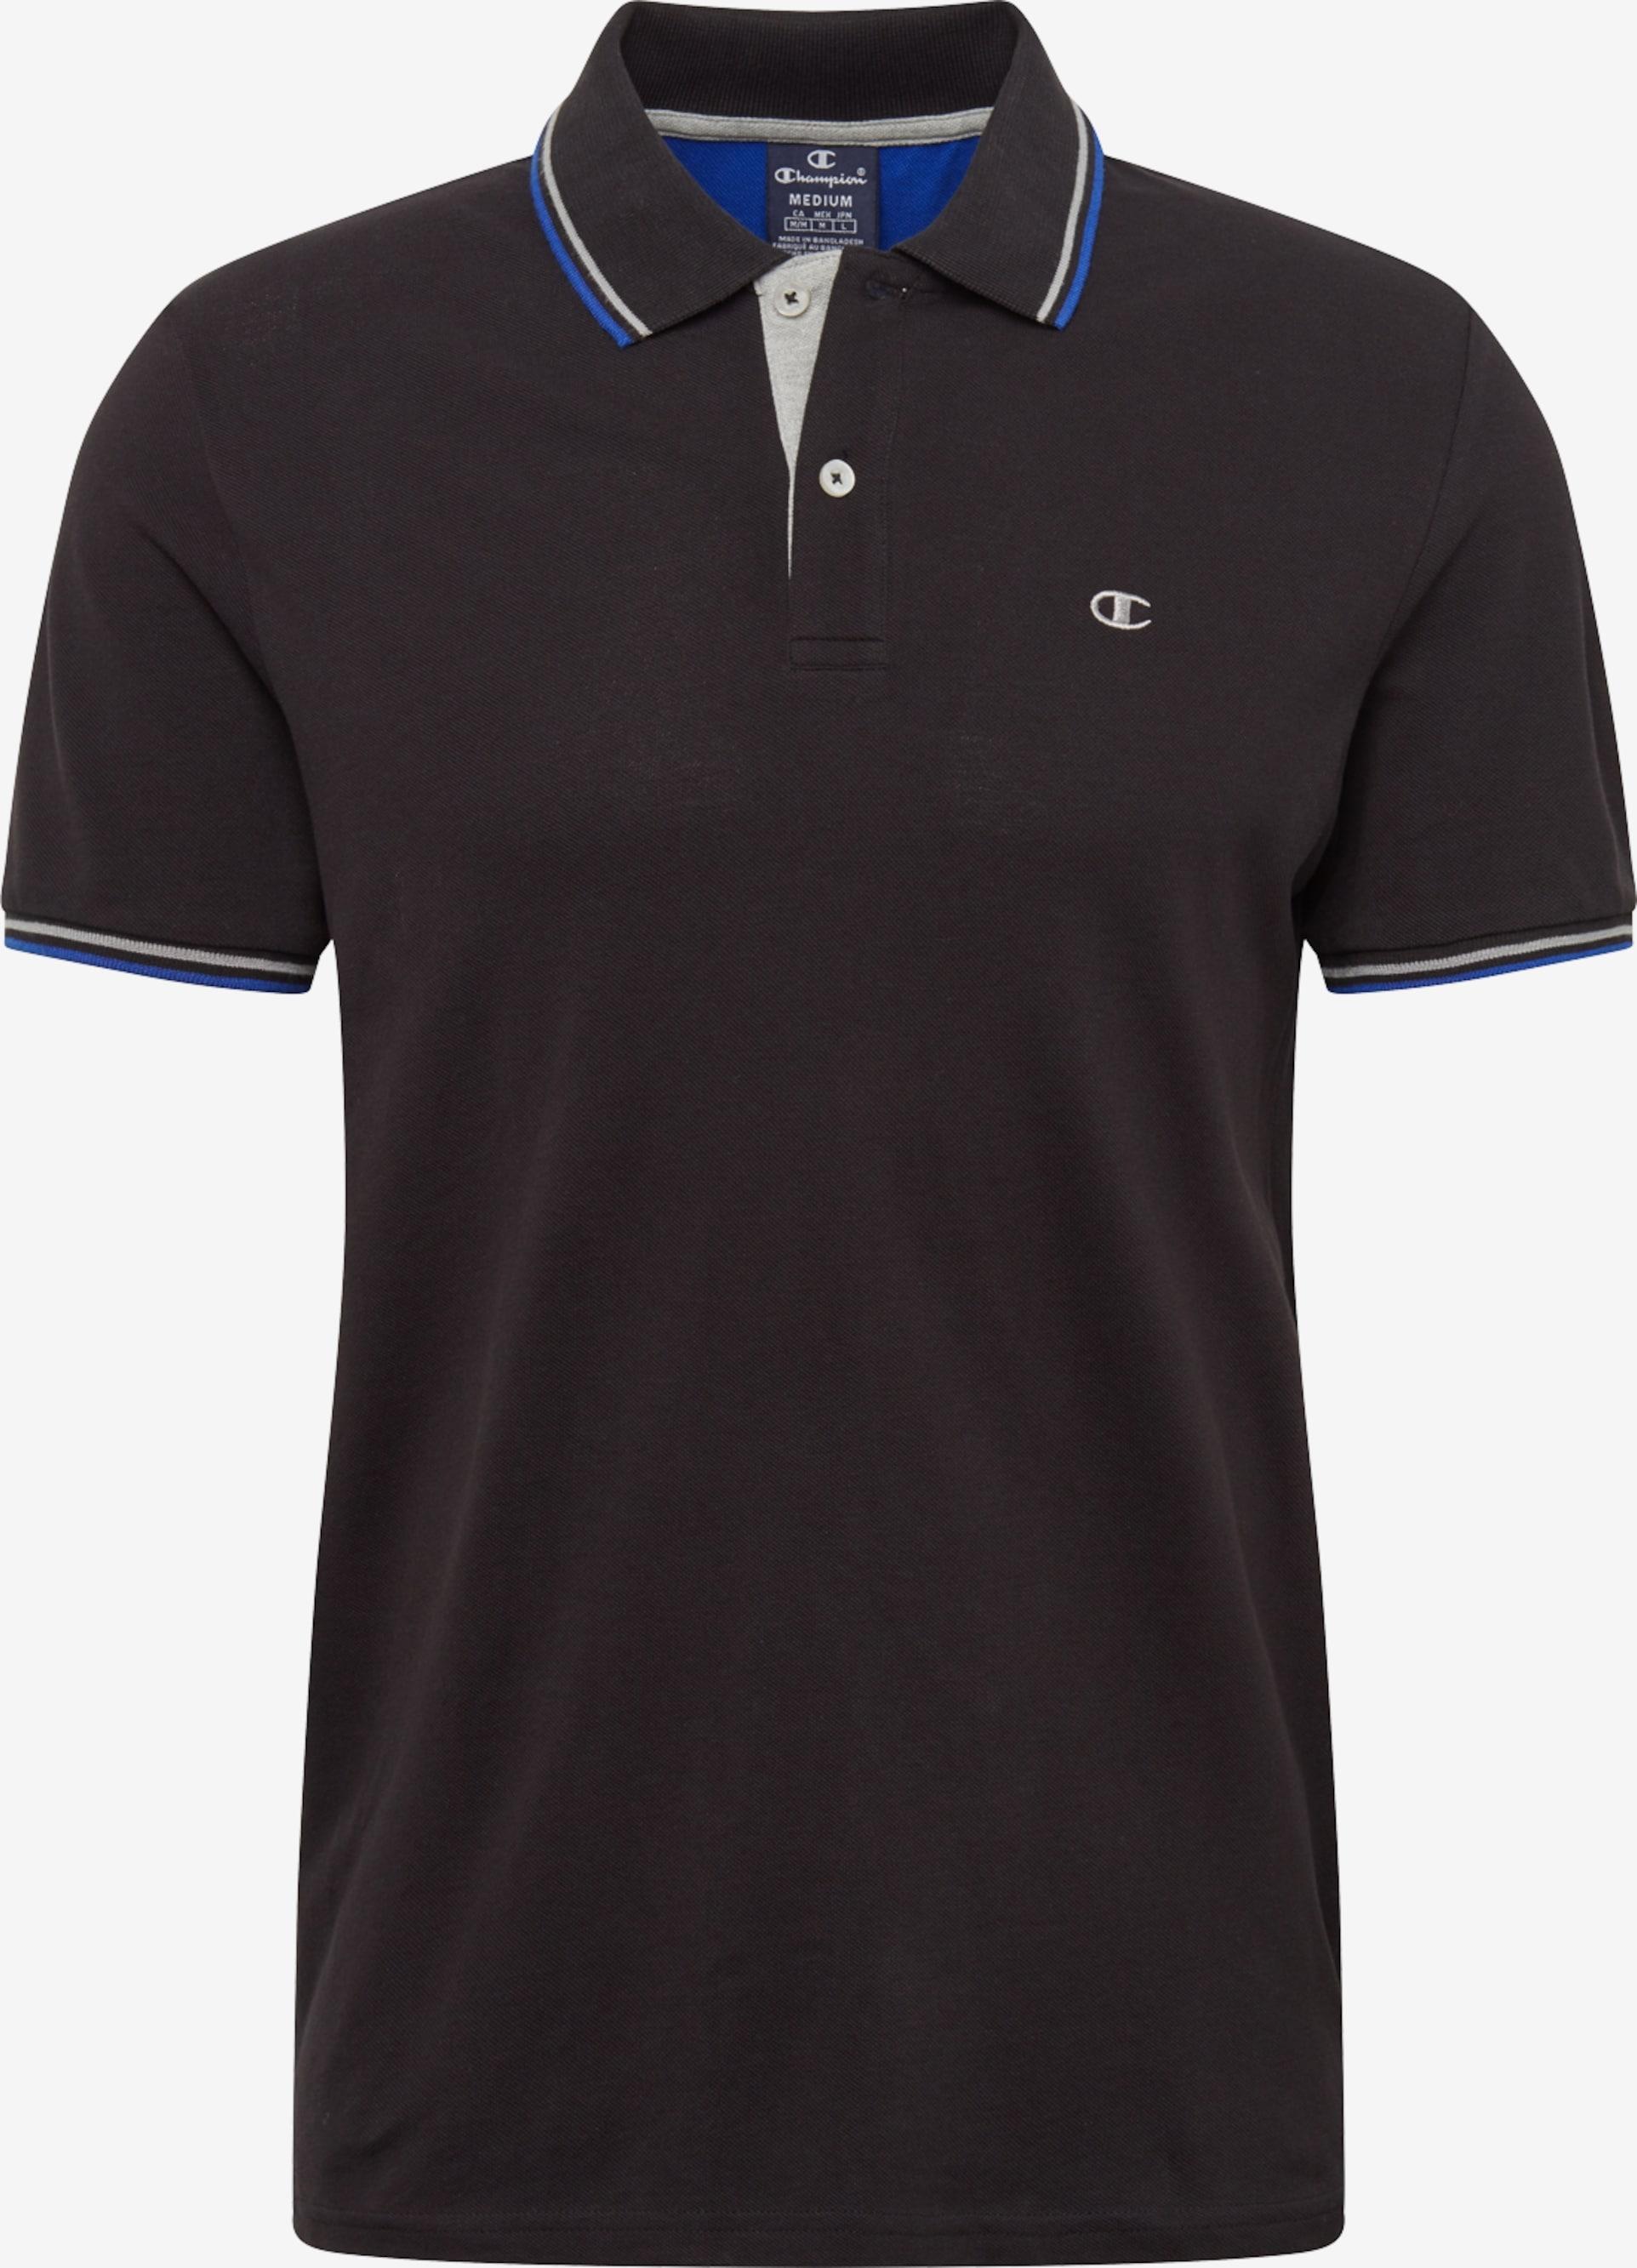 Champion Hr. Polo Shirt Auth 211847 KK002